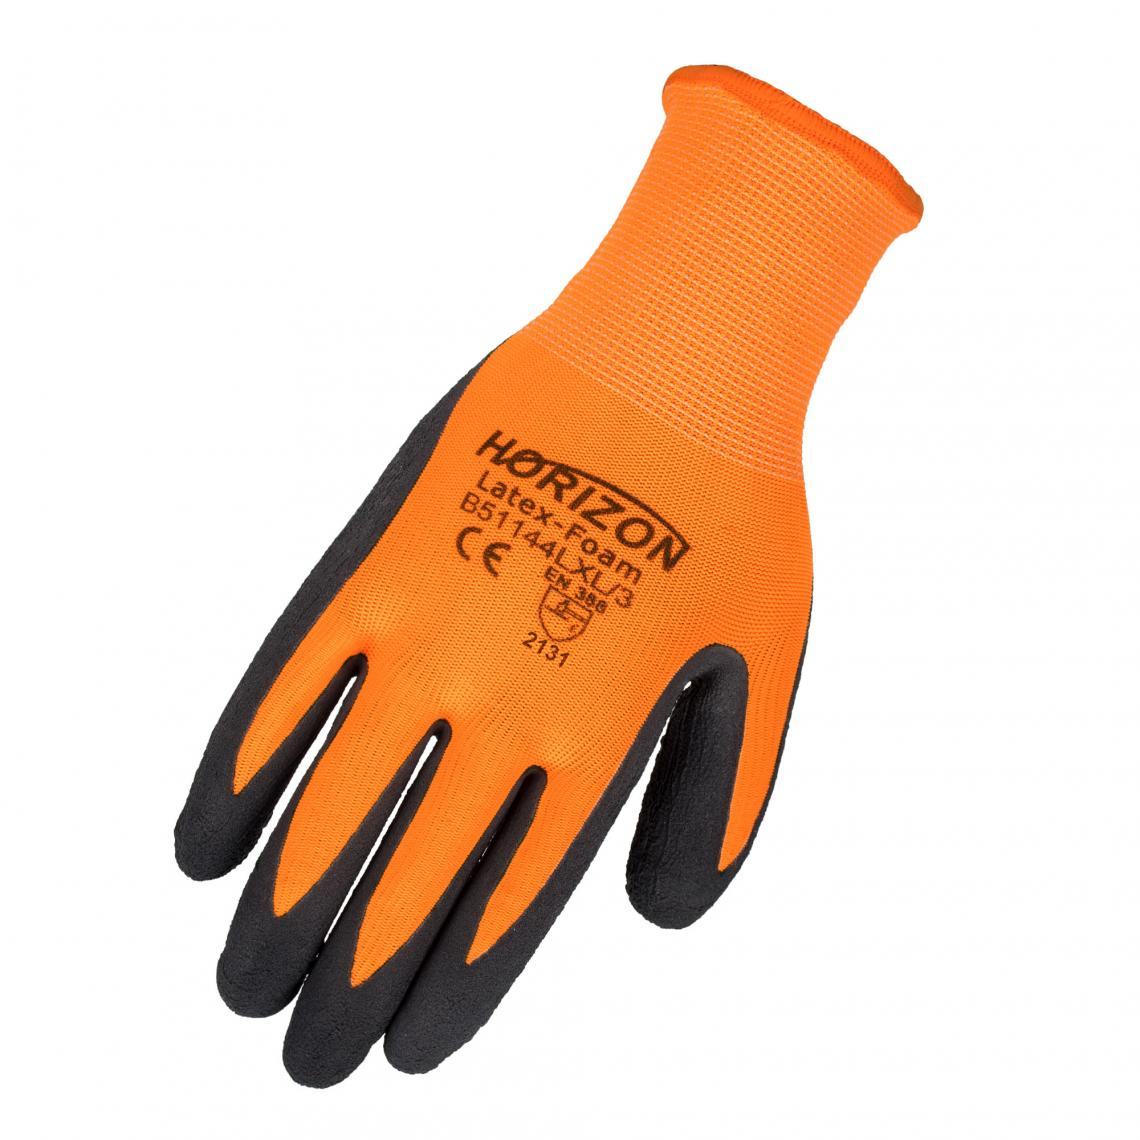 Gloves - Horizon Hi-Vis Latex Coated Glove - Org - L/XL